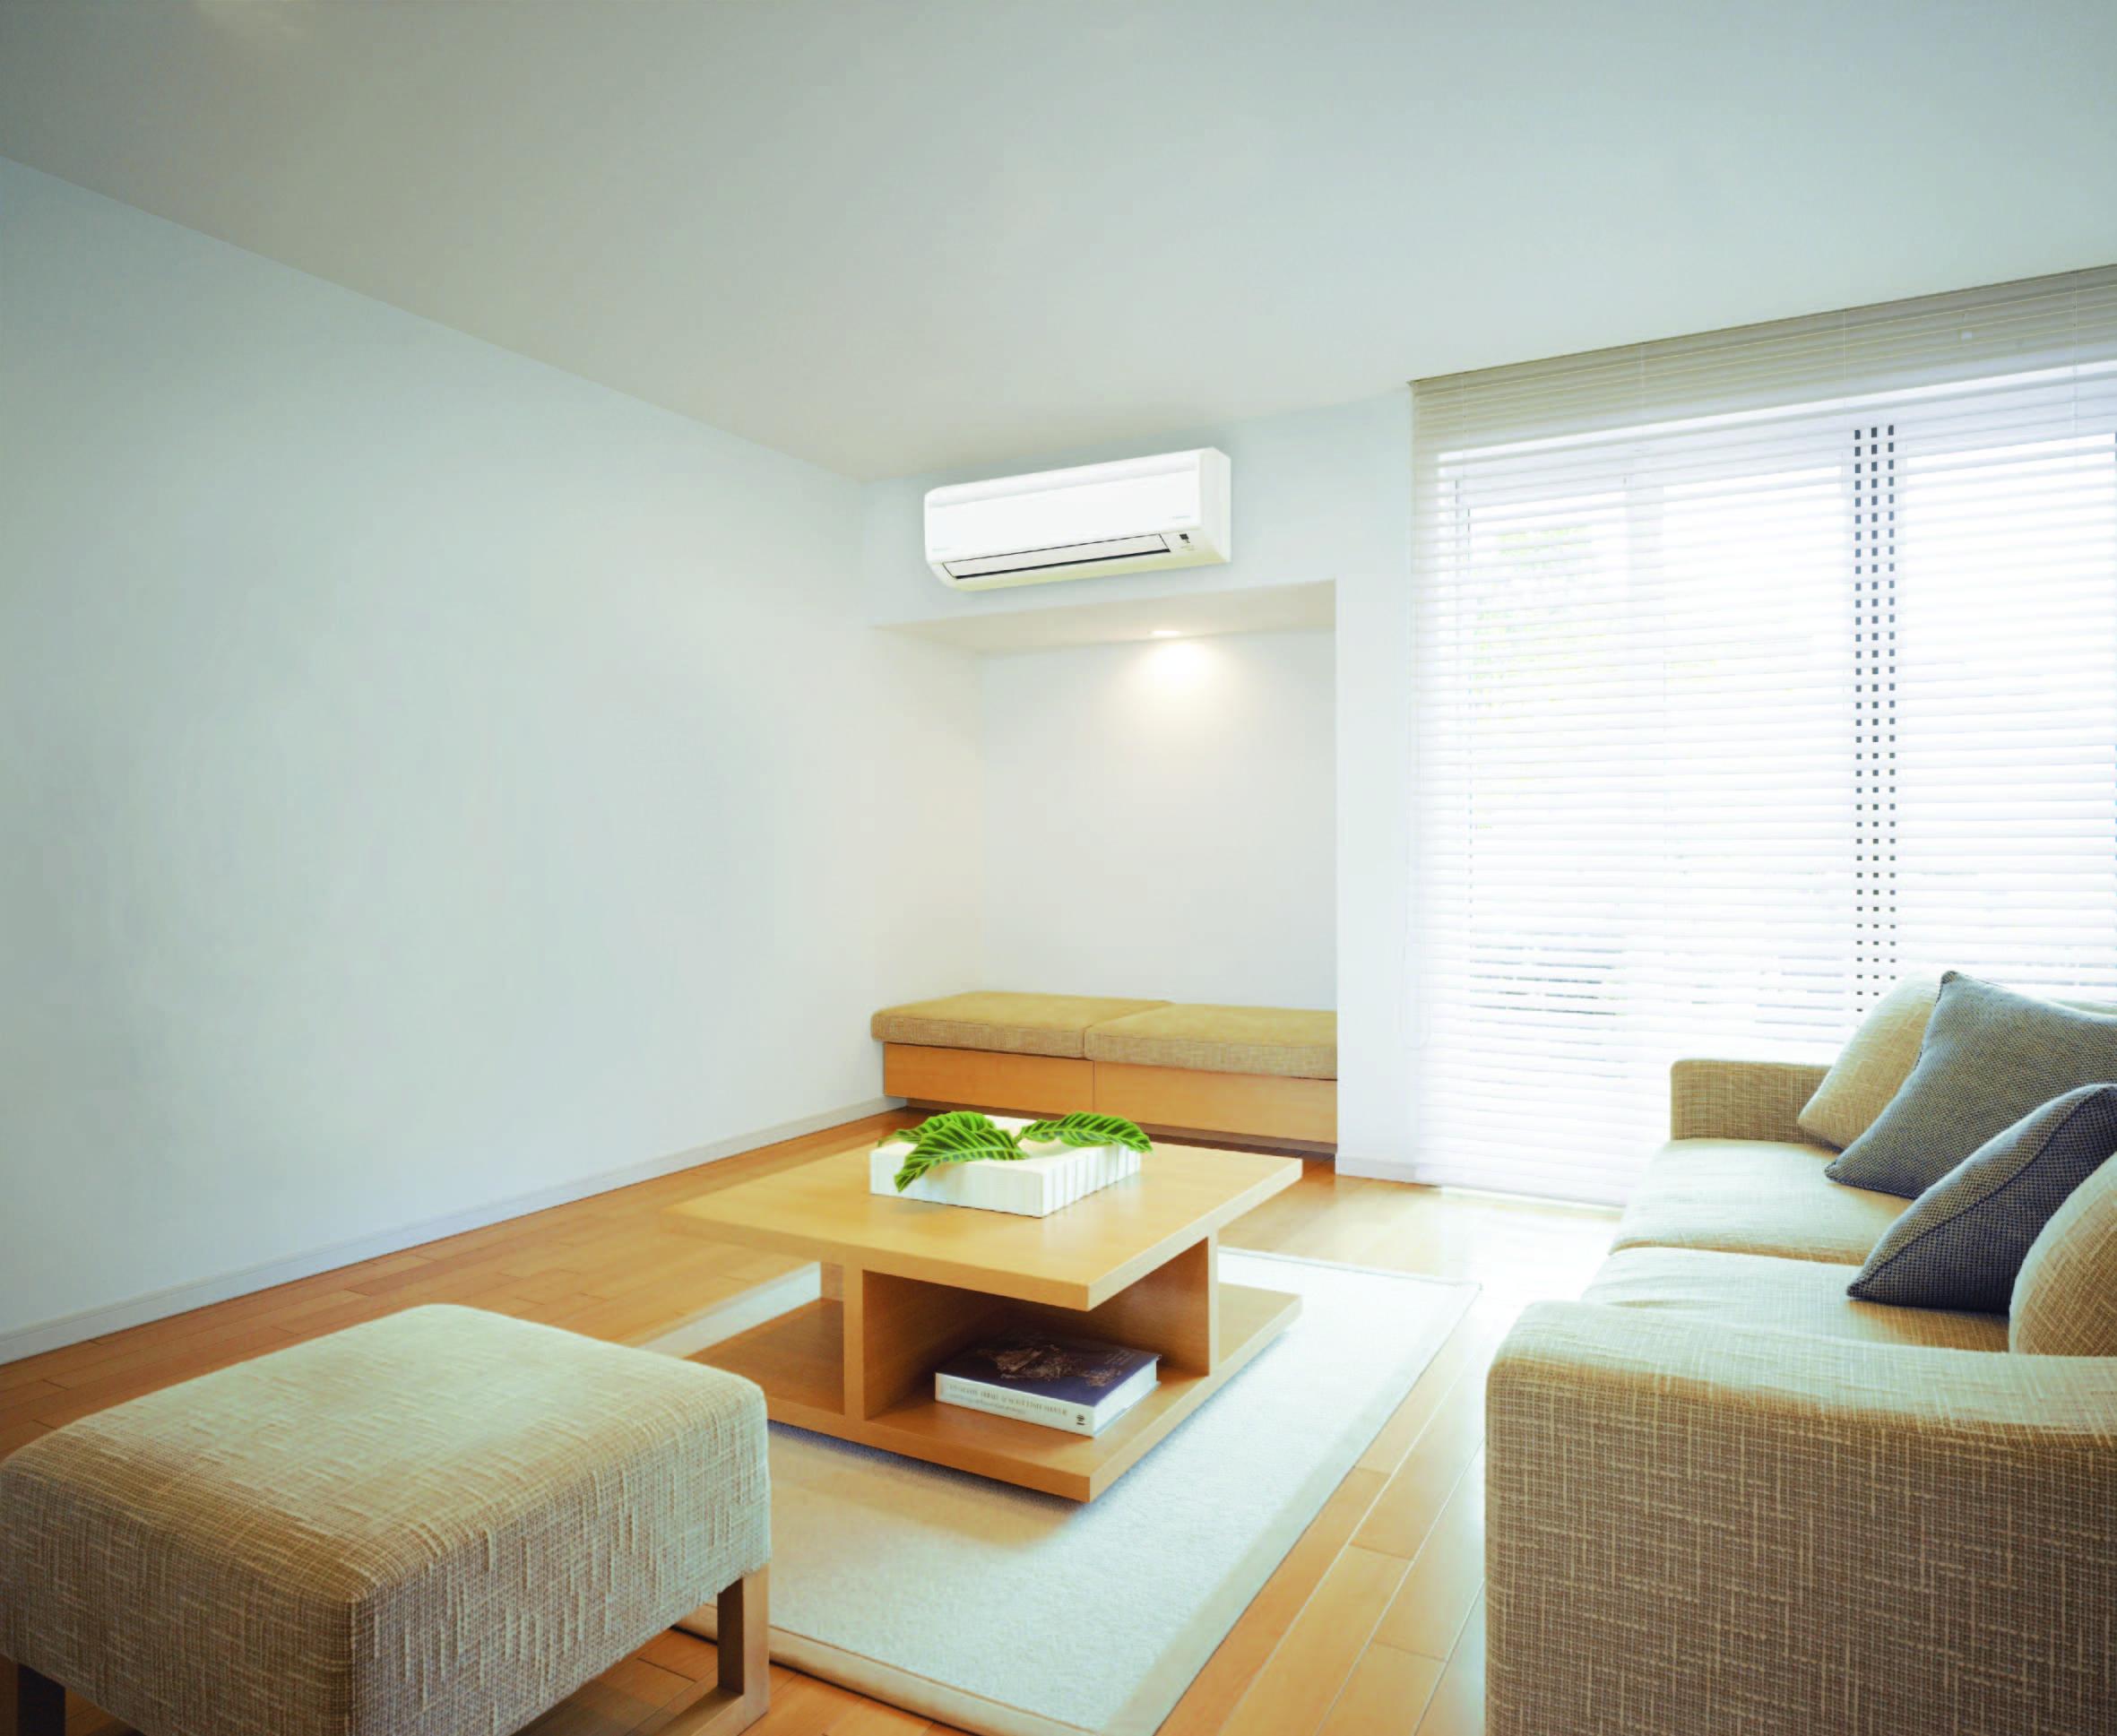 DAIKIN創新空調技術  打造室內舒適未來式